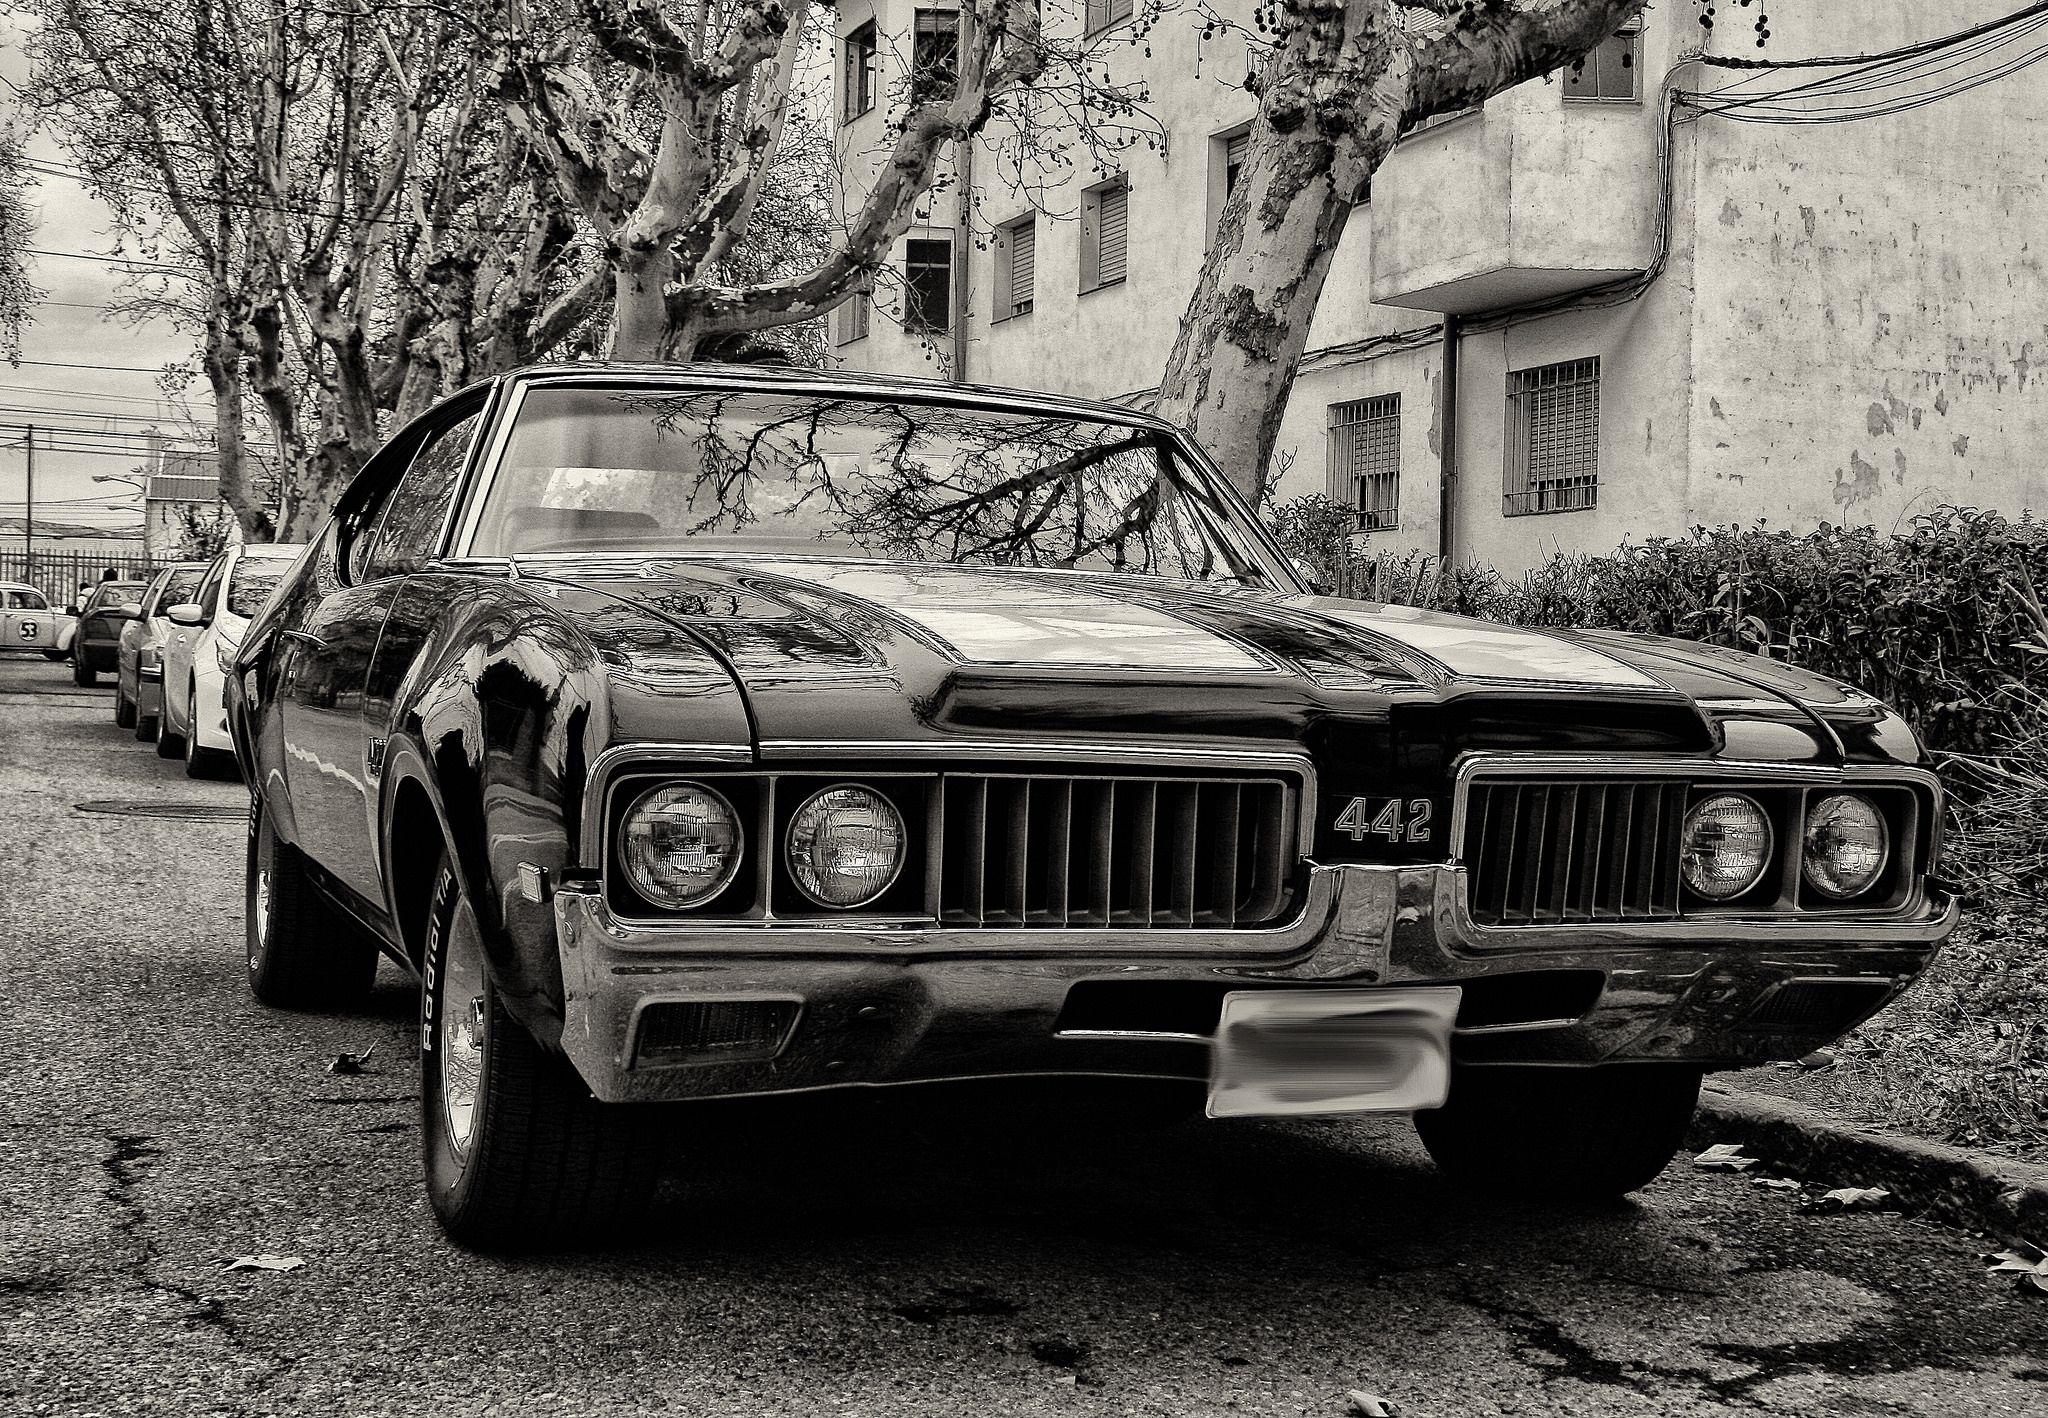 Oldsmobile 442 | by galileo1657